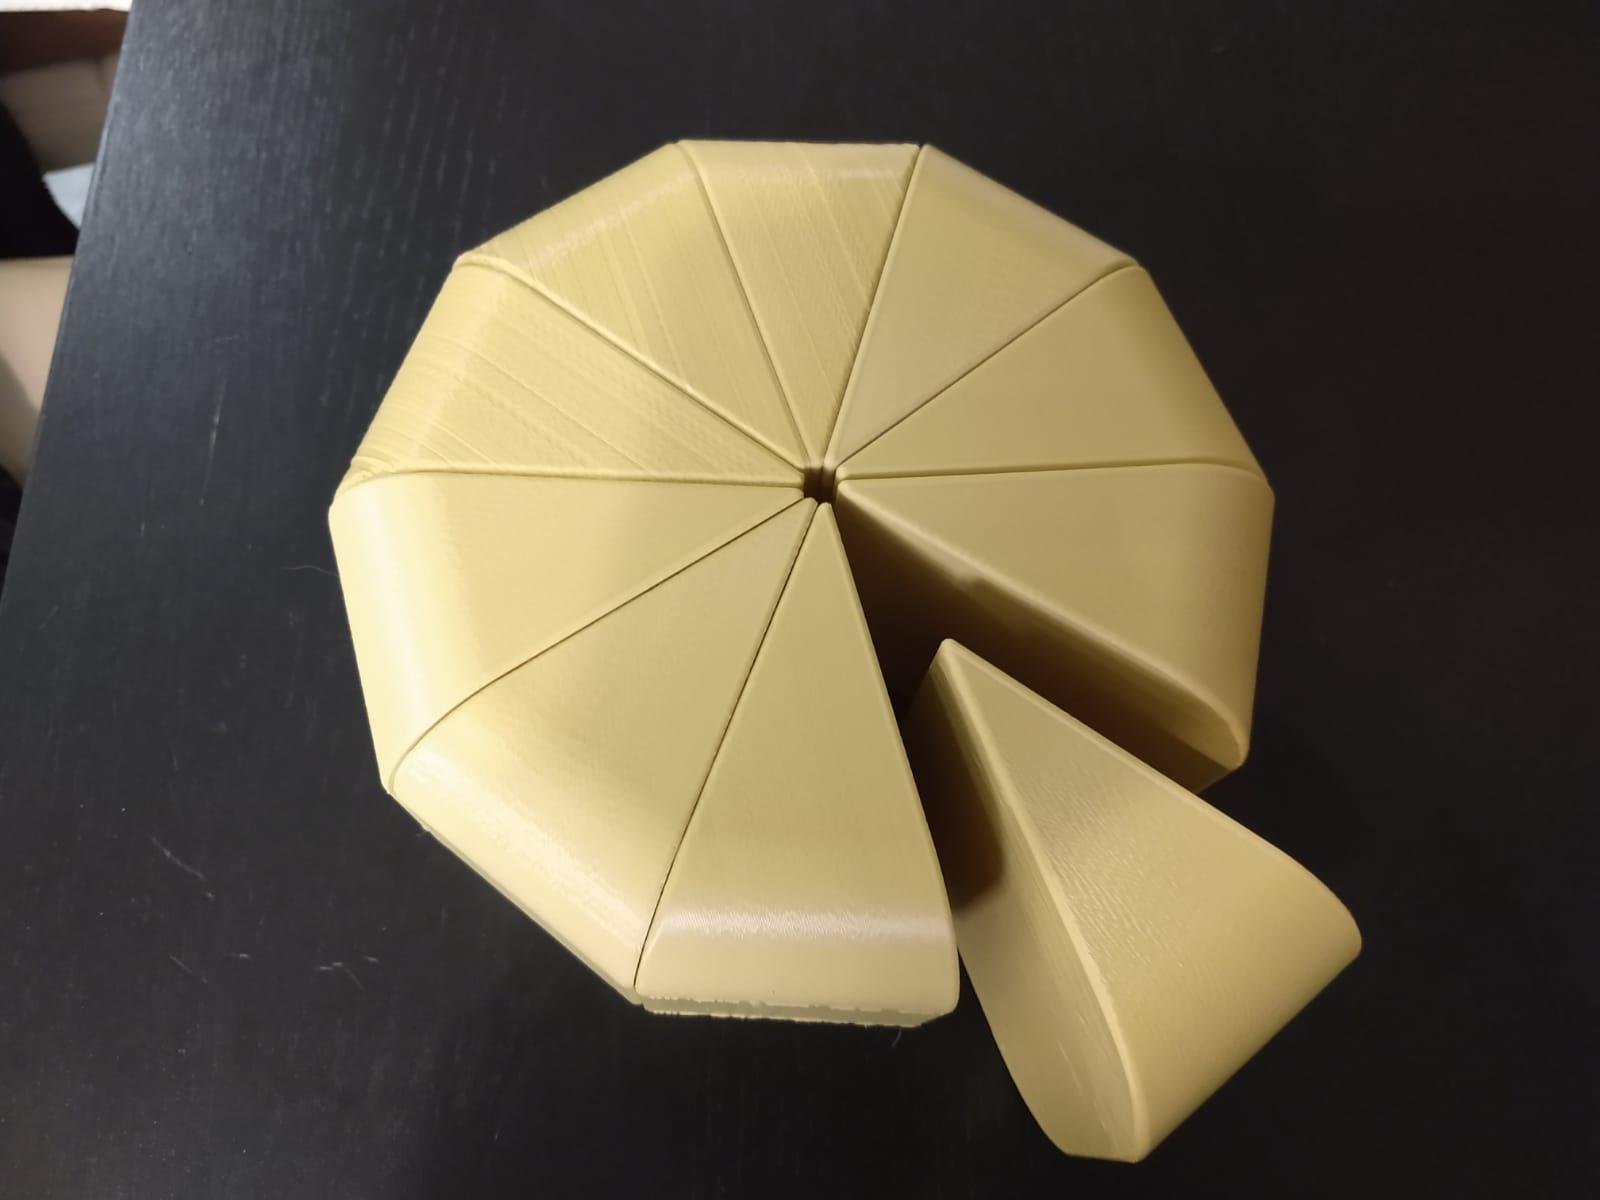 3D Printing Limburg | https://www.3dprintinglimburg.nl/files/afbeeldingen/portfolio/FNZKaas1.jpg